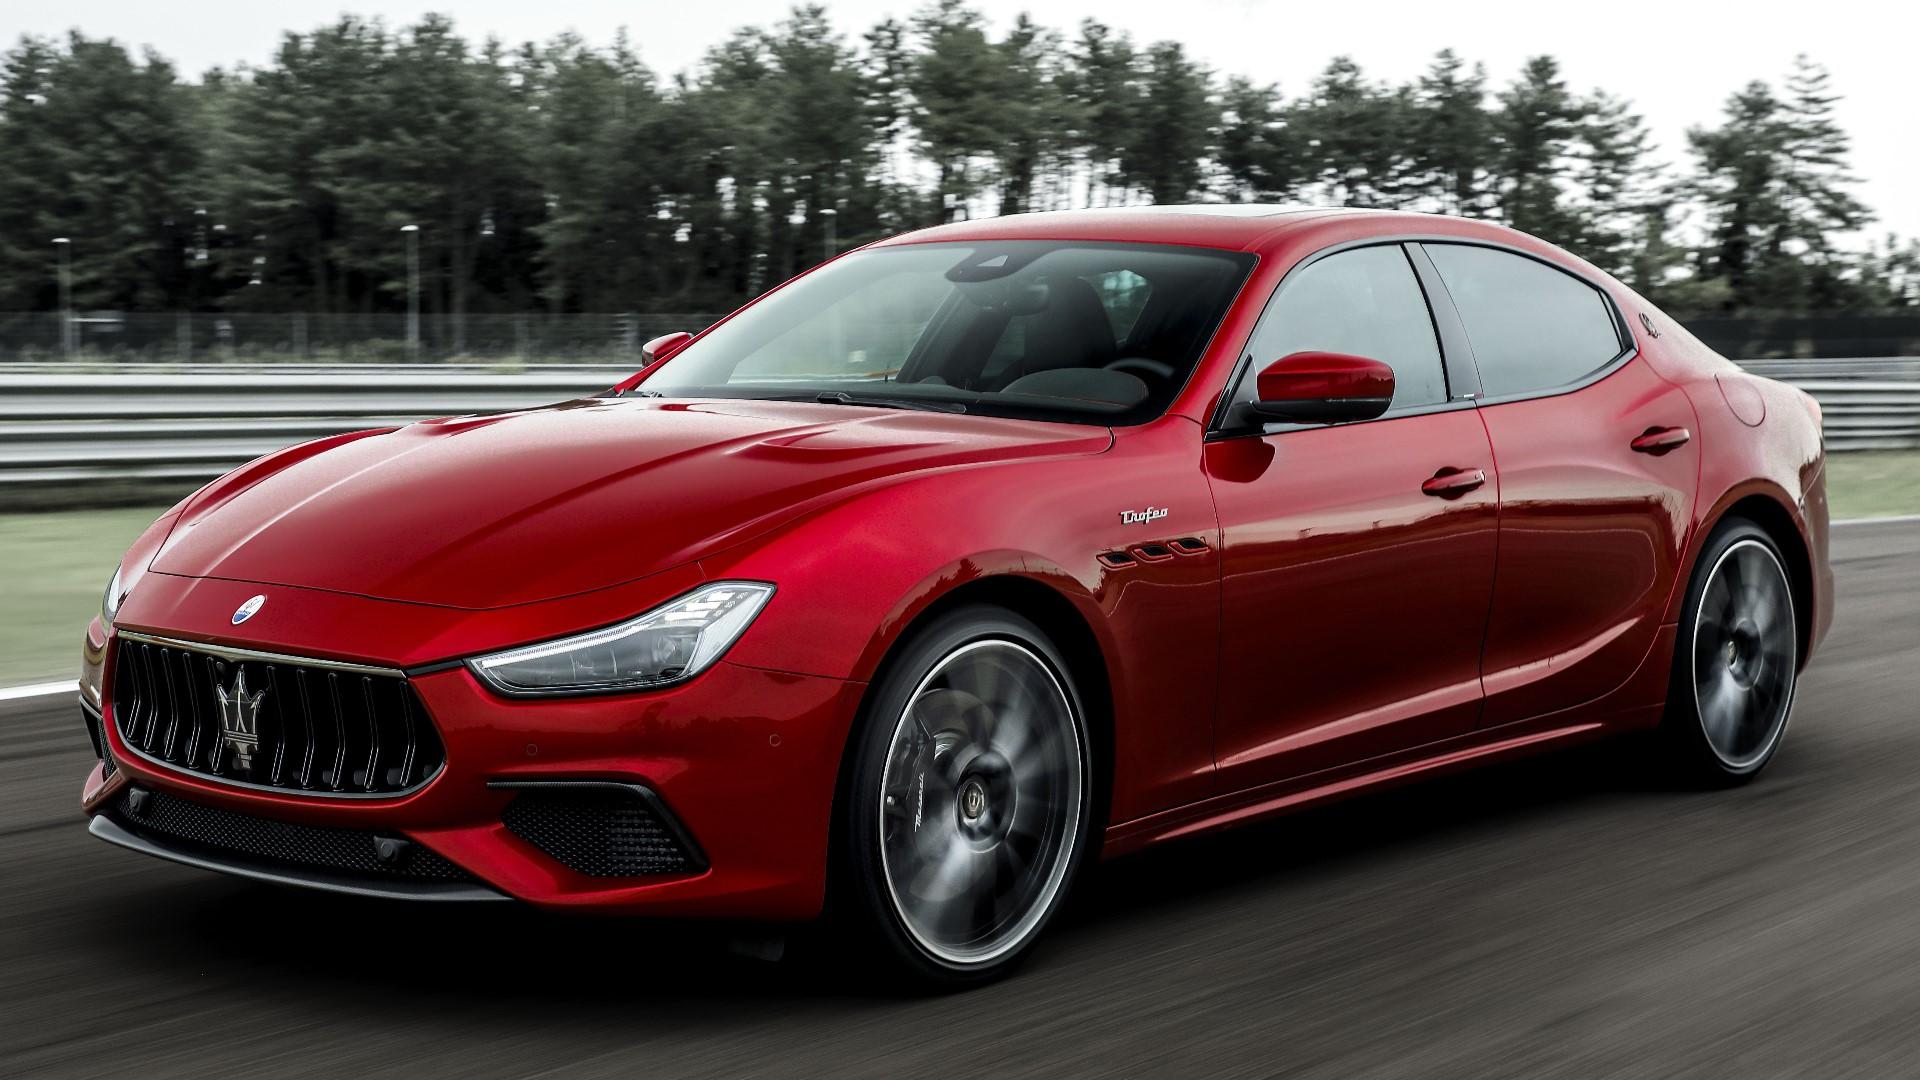 2021 Maserati Ghibli İnceleme